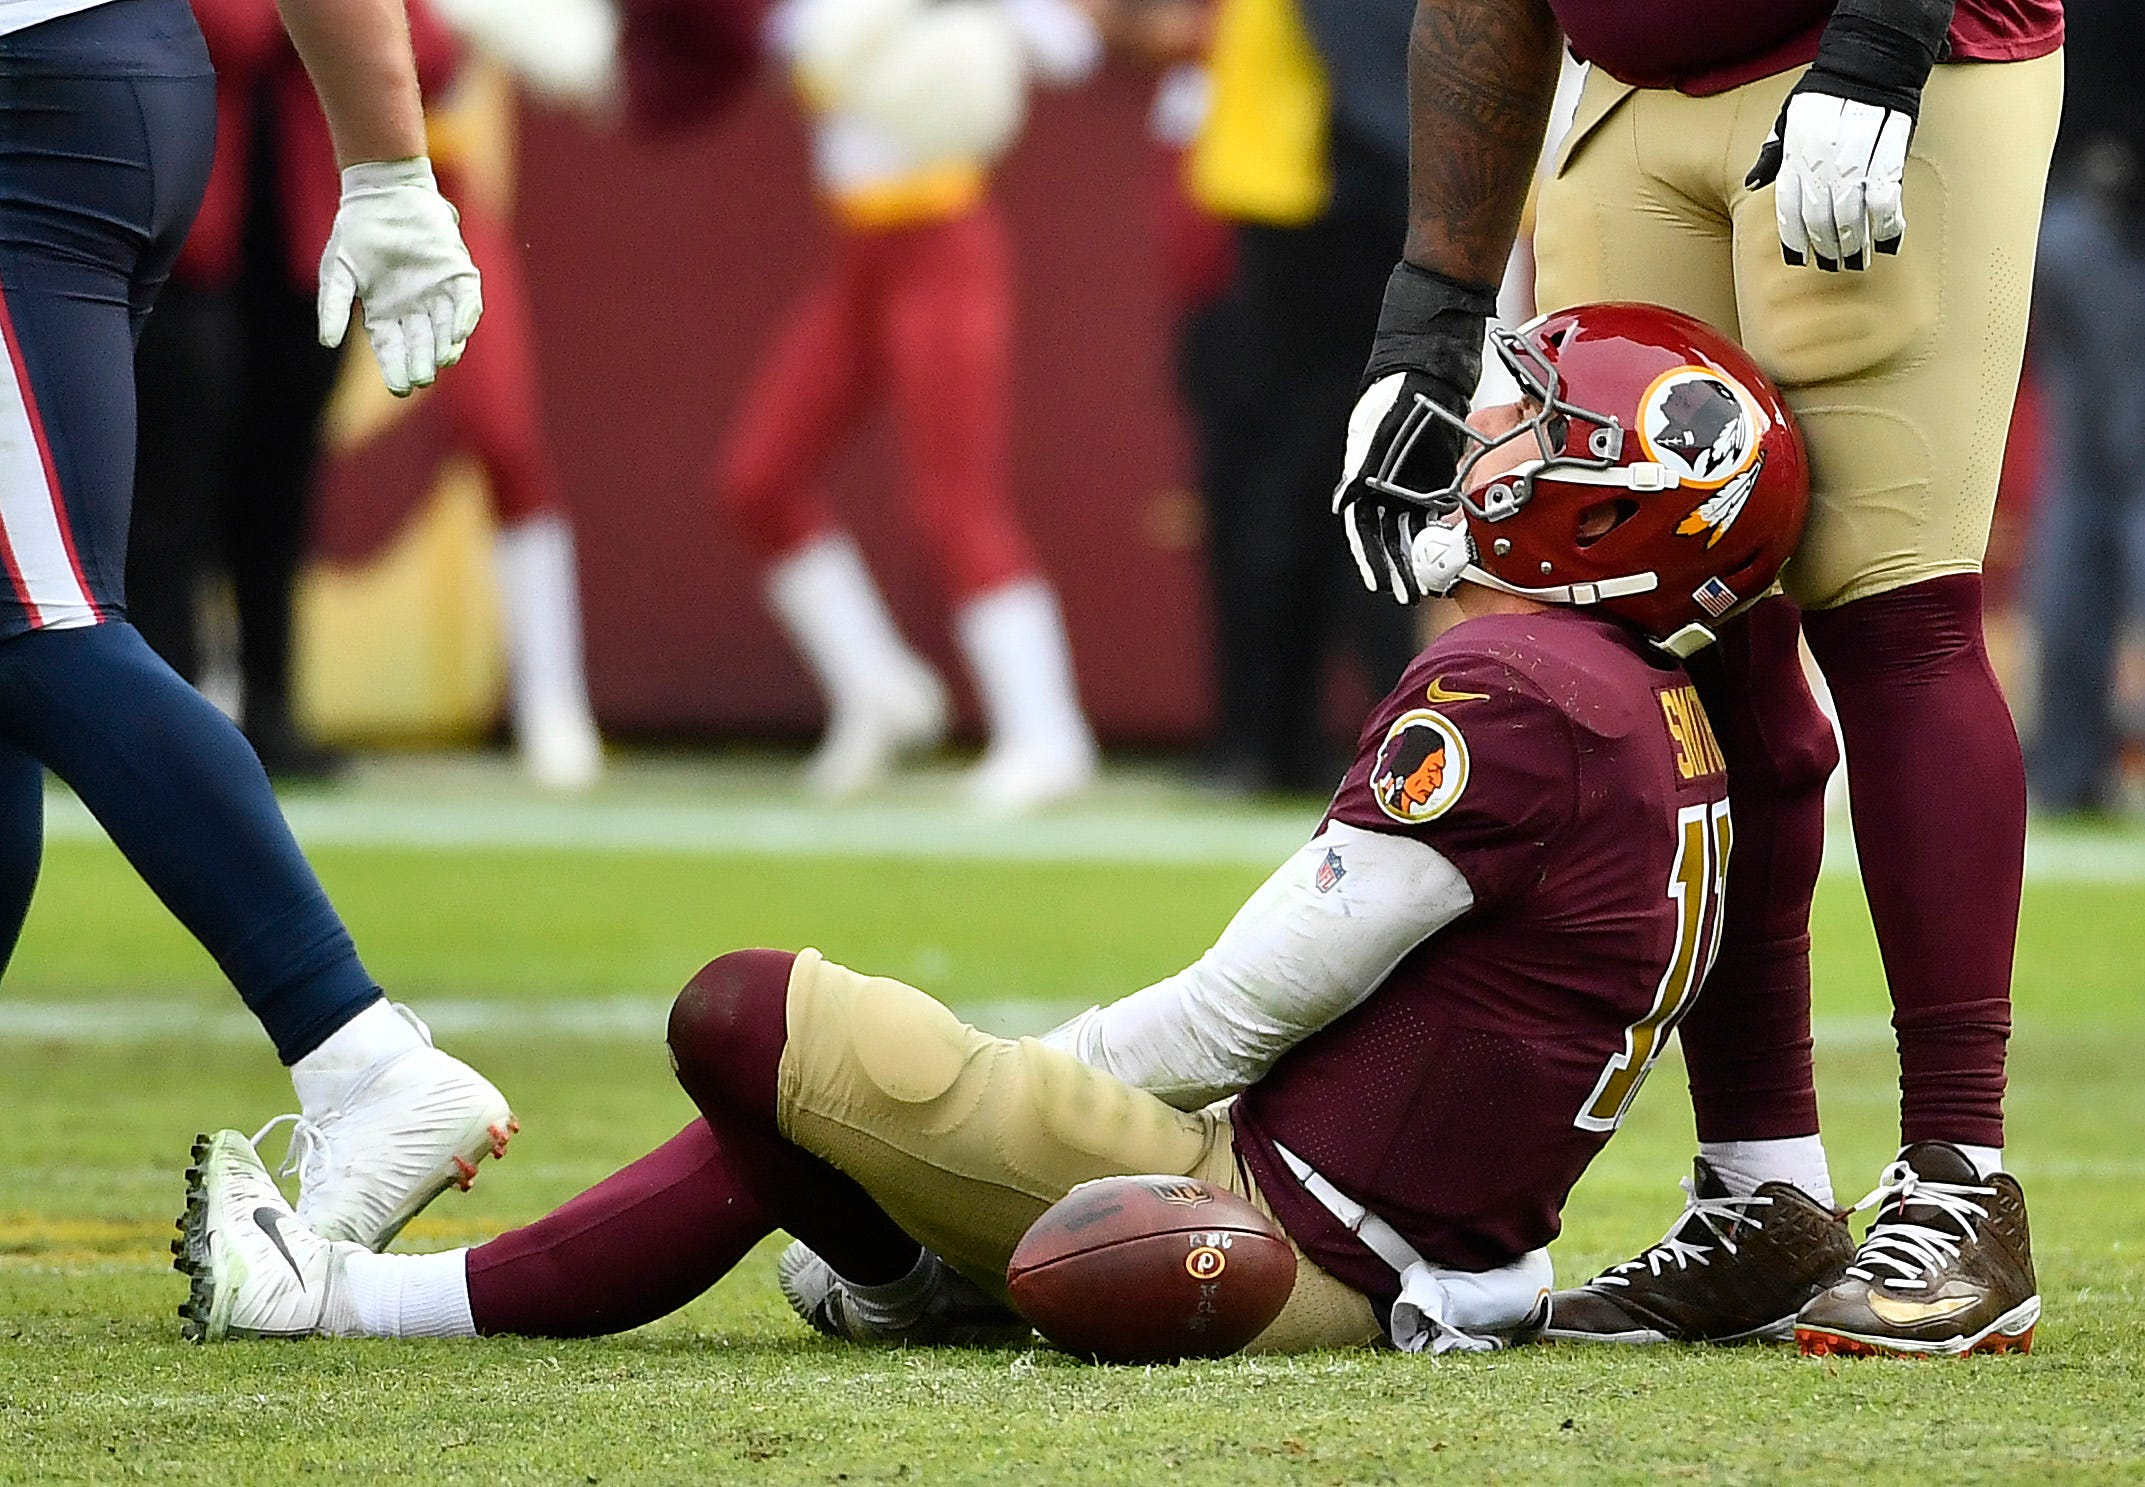 Alex Smith, QB, Washington Redskins (broken leg, out for season)